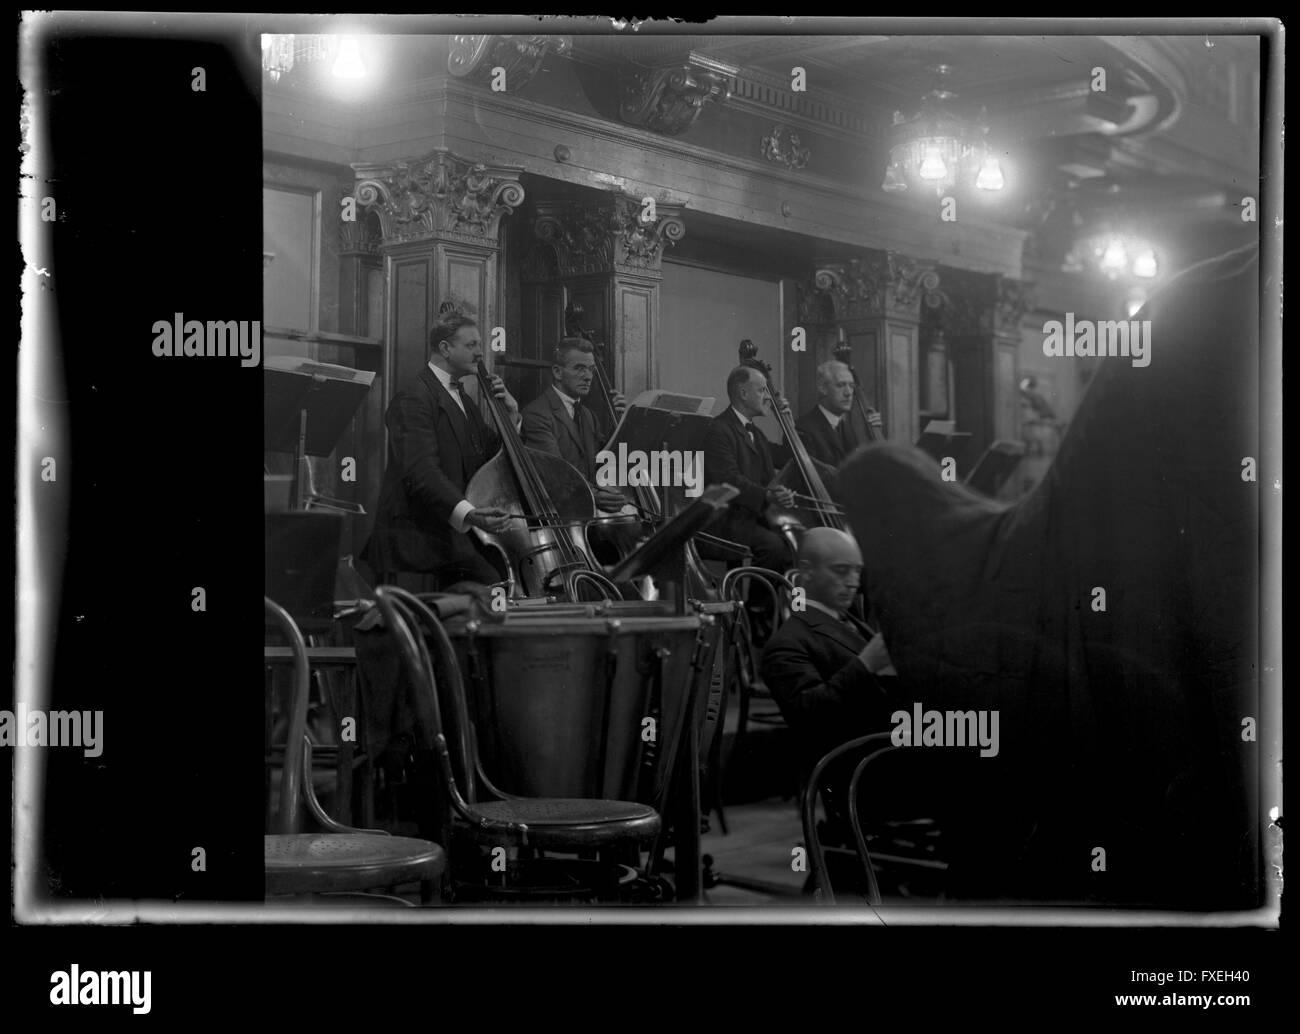 Bassgeiger der Wiener Philharmoniker - Stock Image